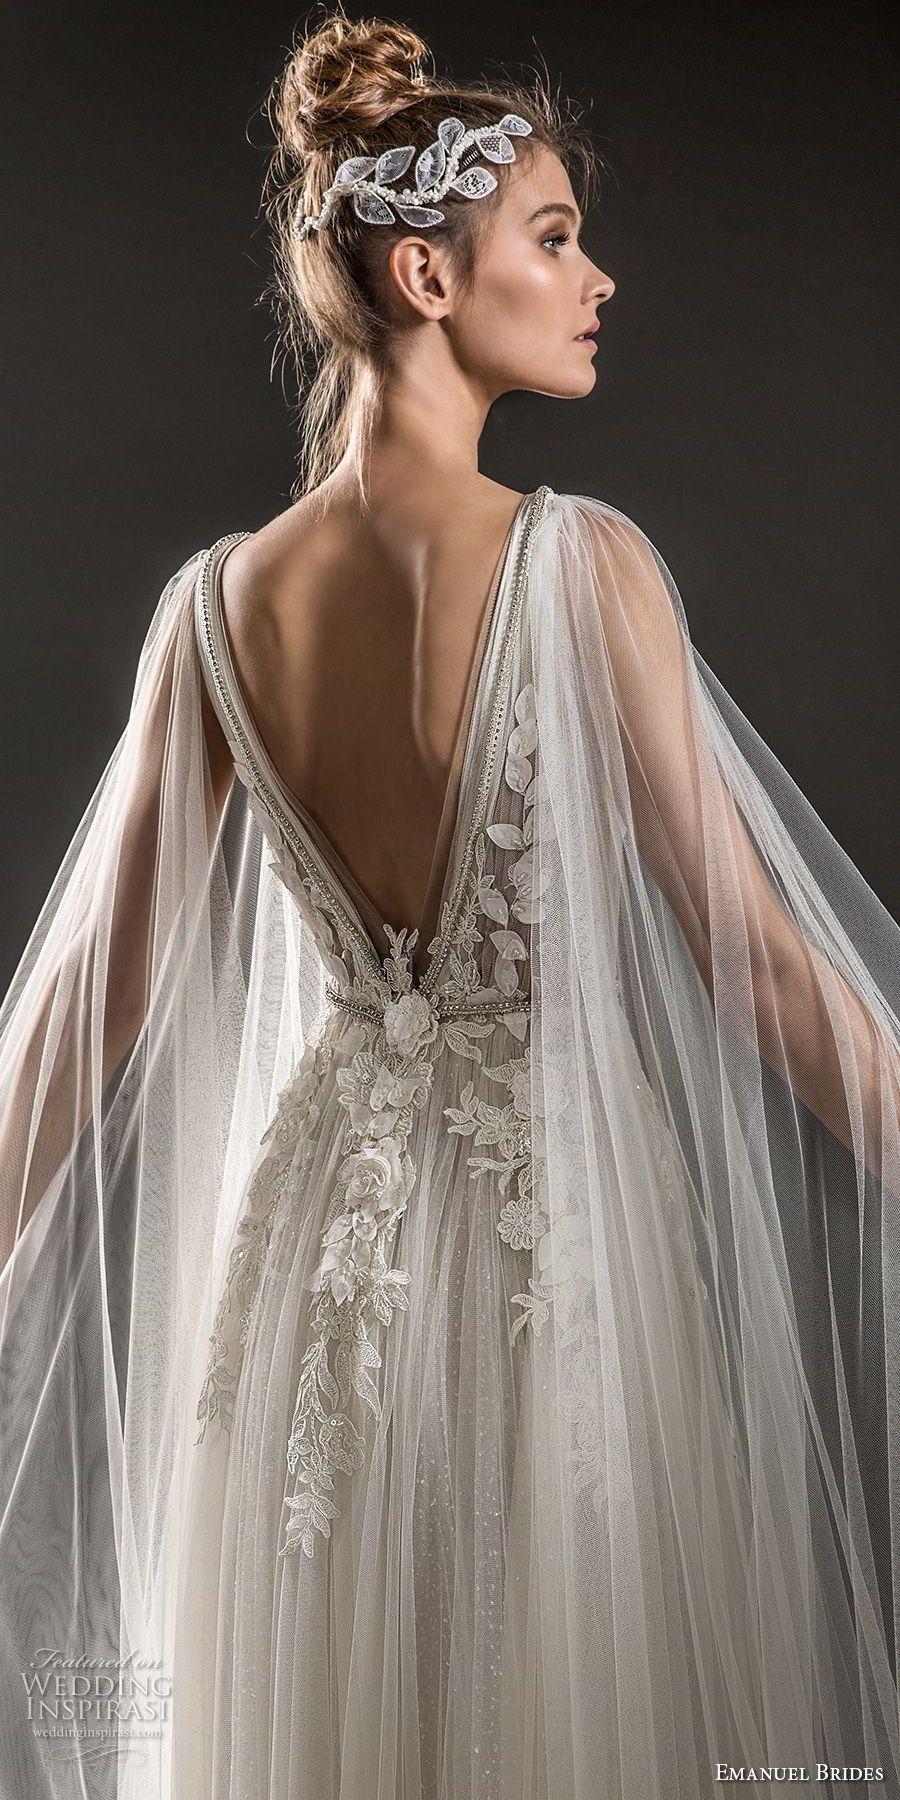 Emanuel brides wedding dresses wedding pinterest wedding